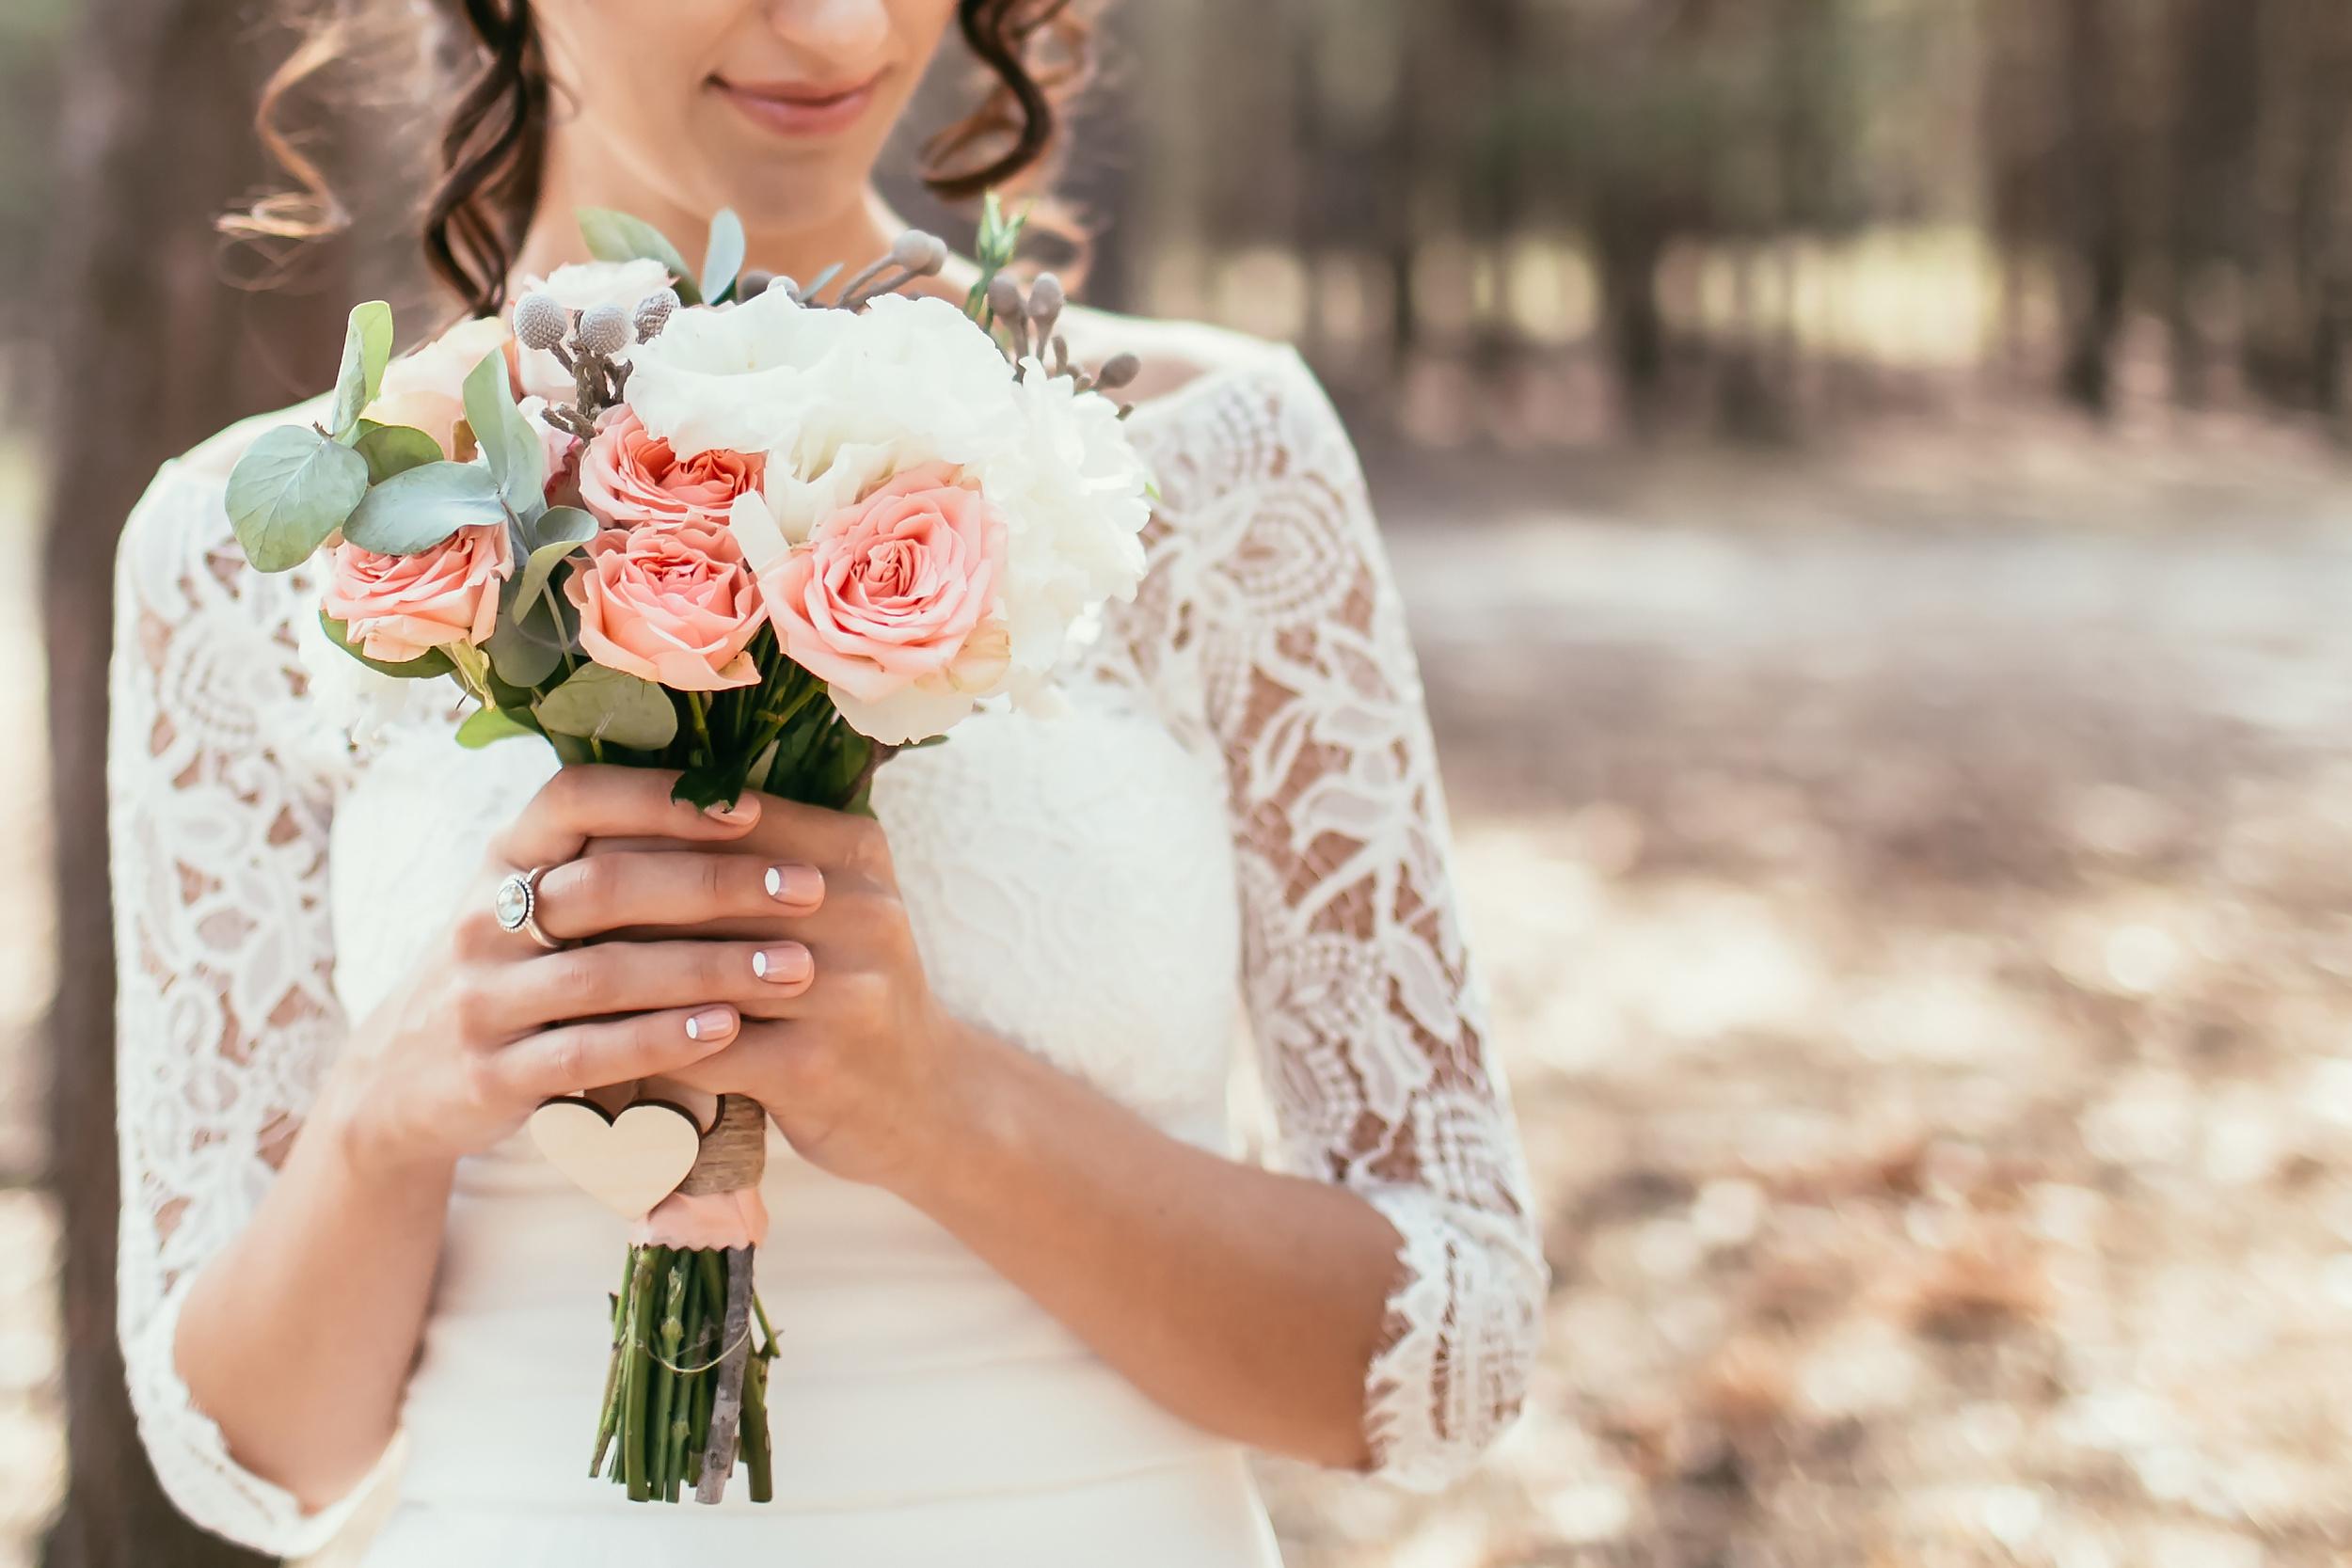 Book your wedding videographer